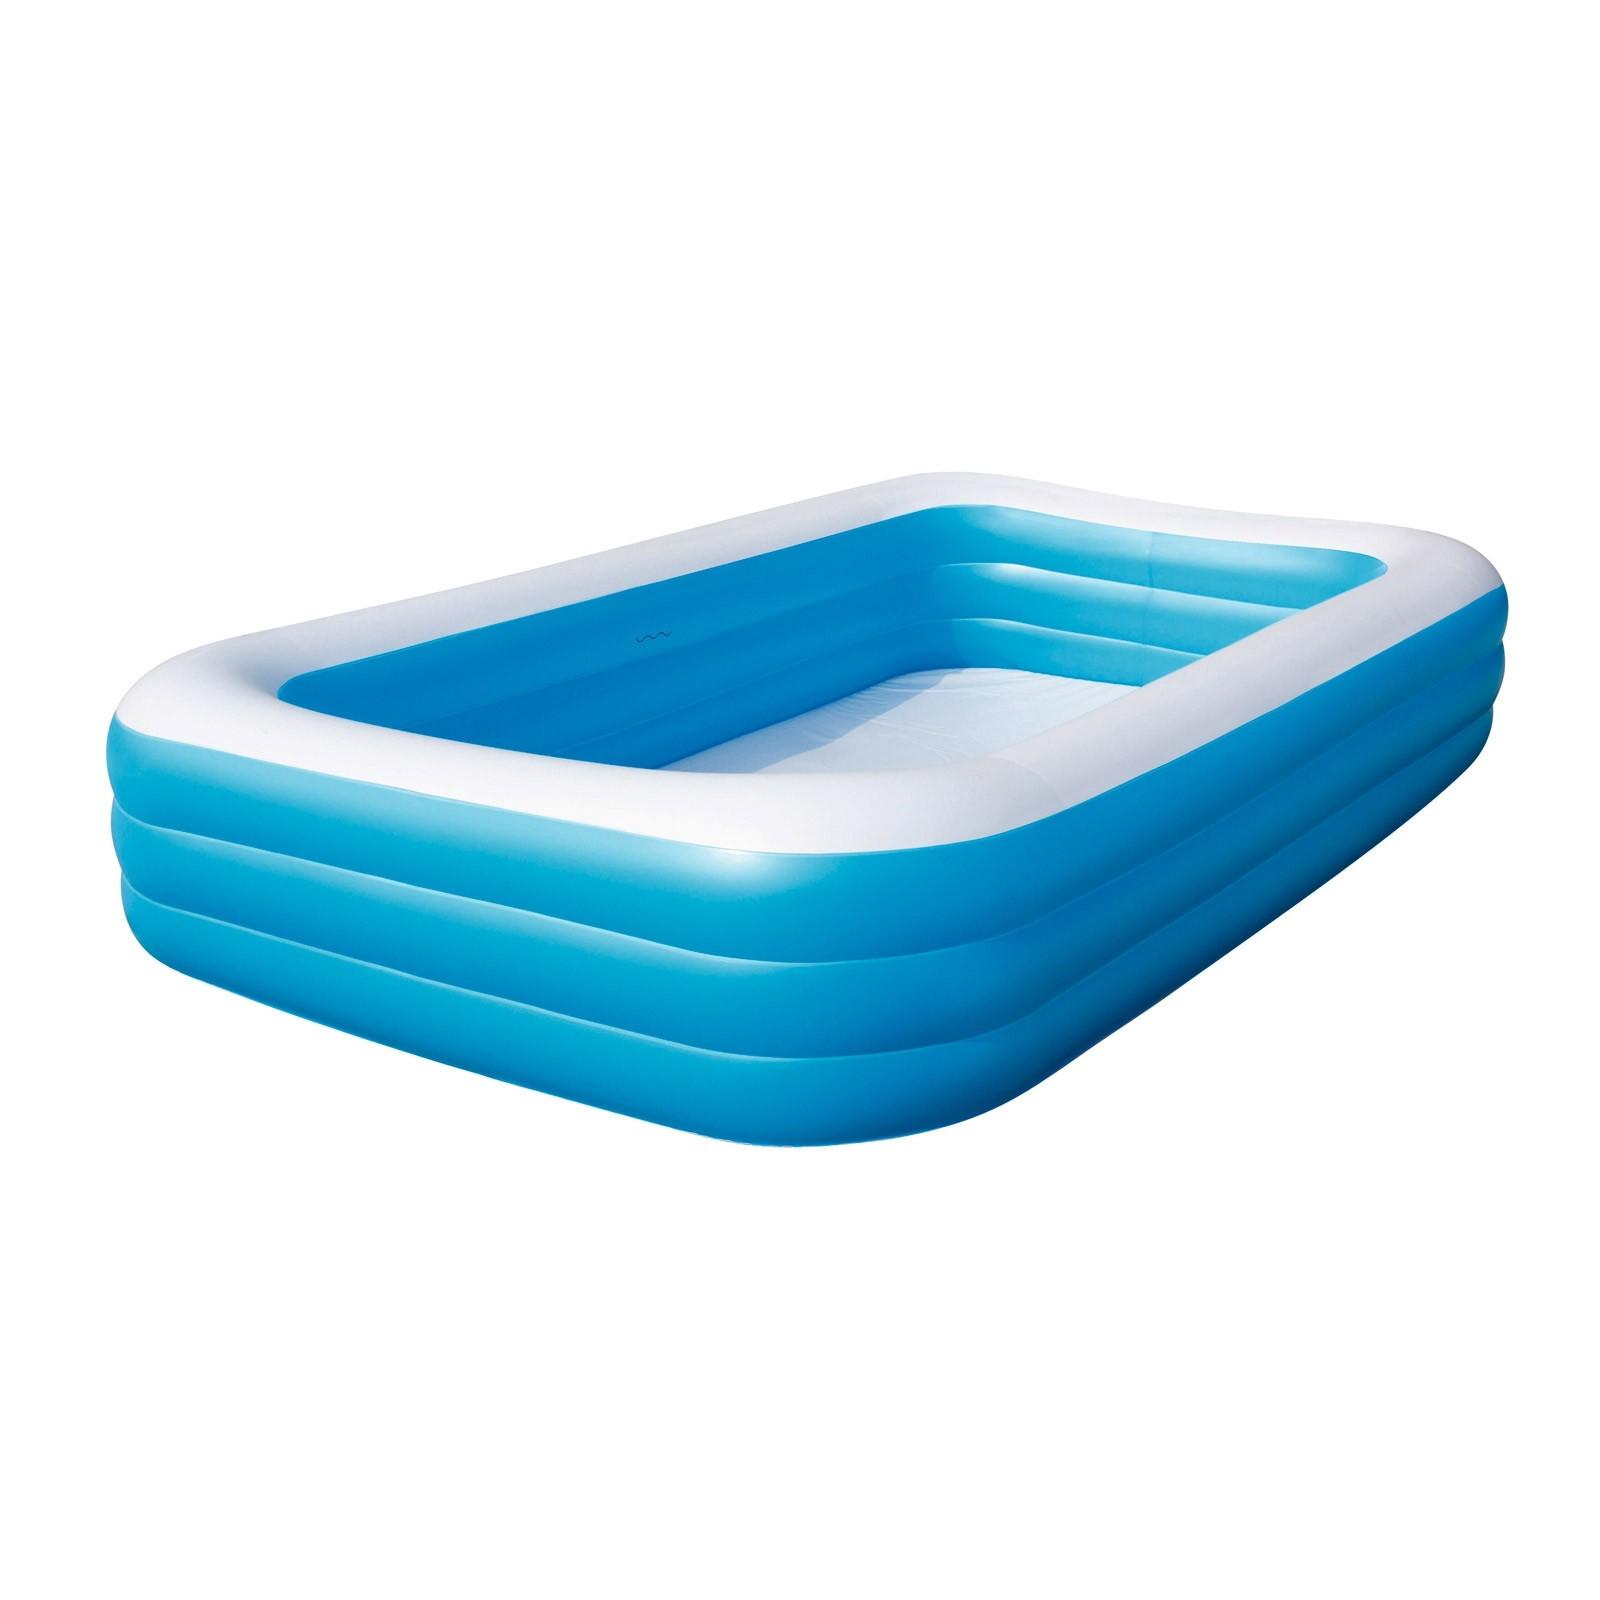 Dema Swimmingpool / Planschbecken 305x183x56 cm 17599